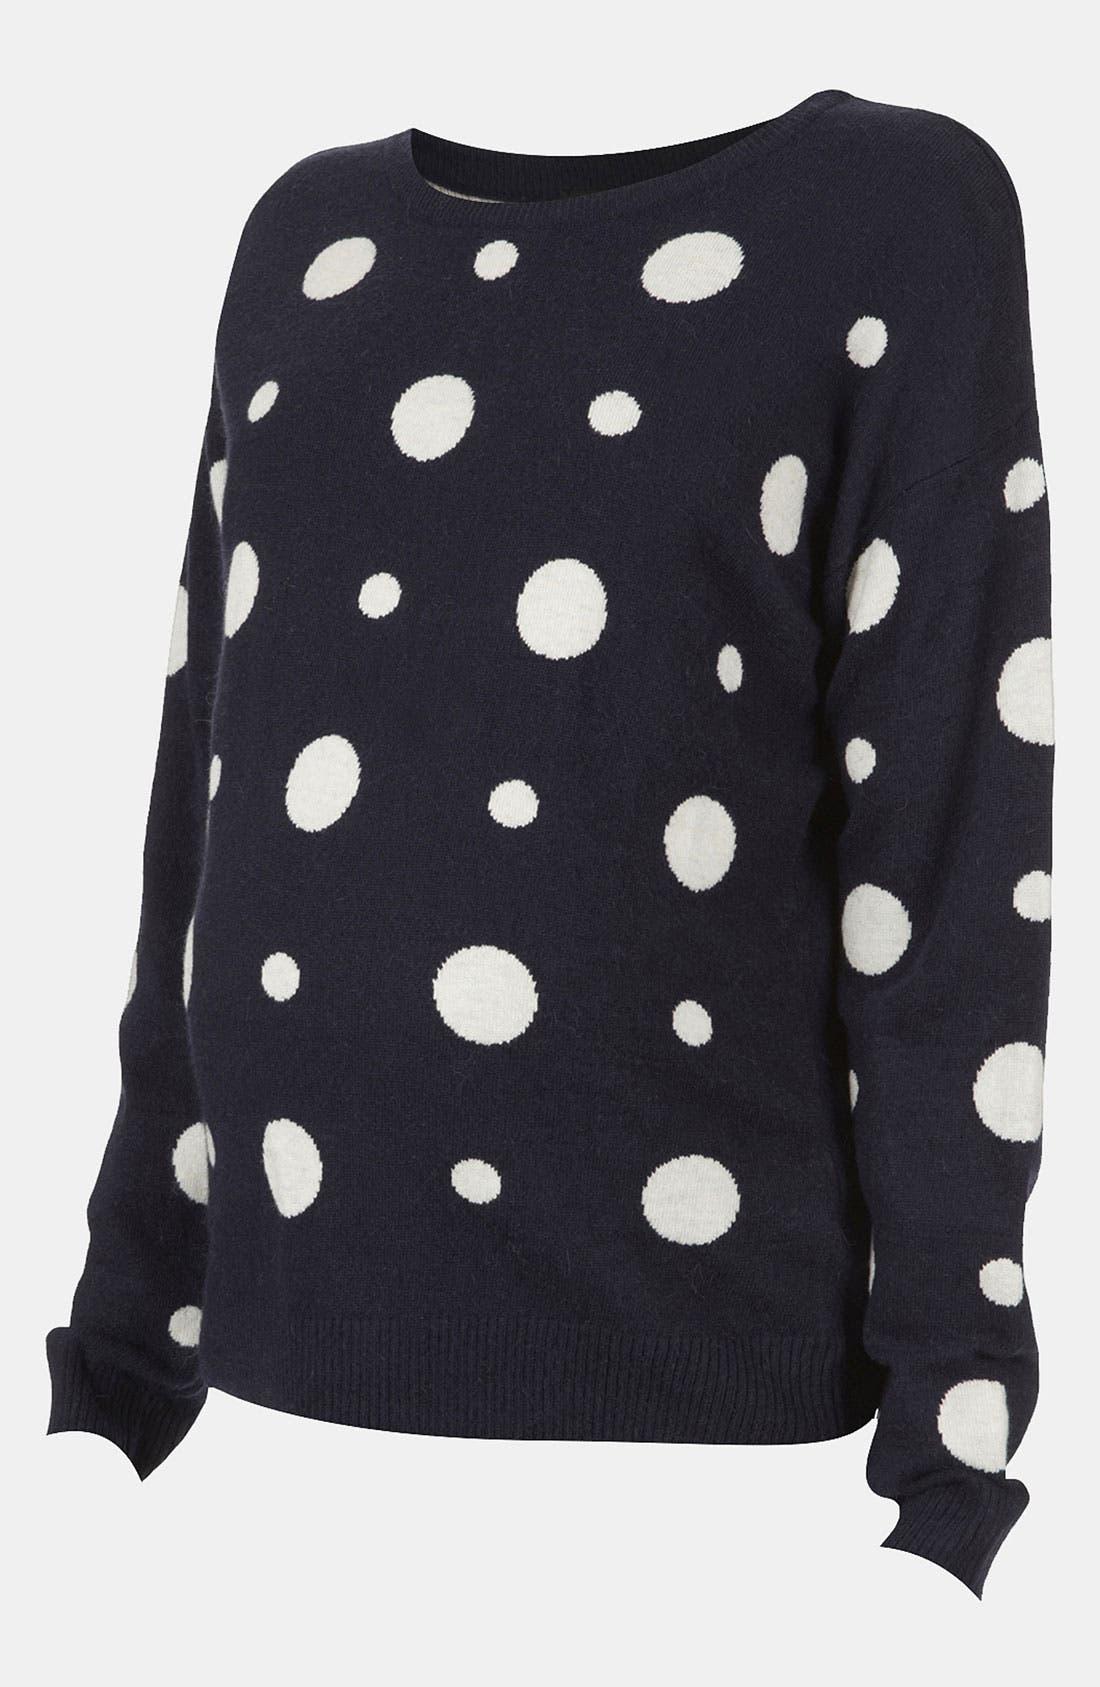 Alternate Image 1 Selected - Topshop Dot Maternity Sweater